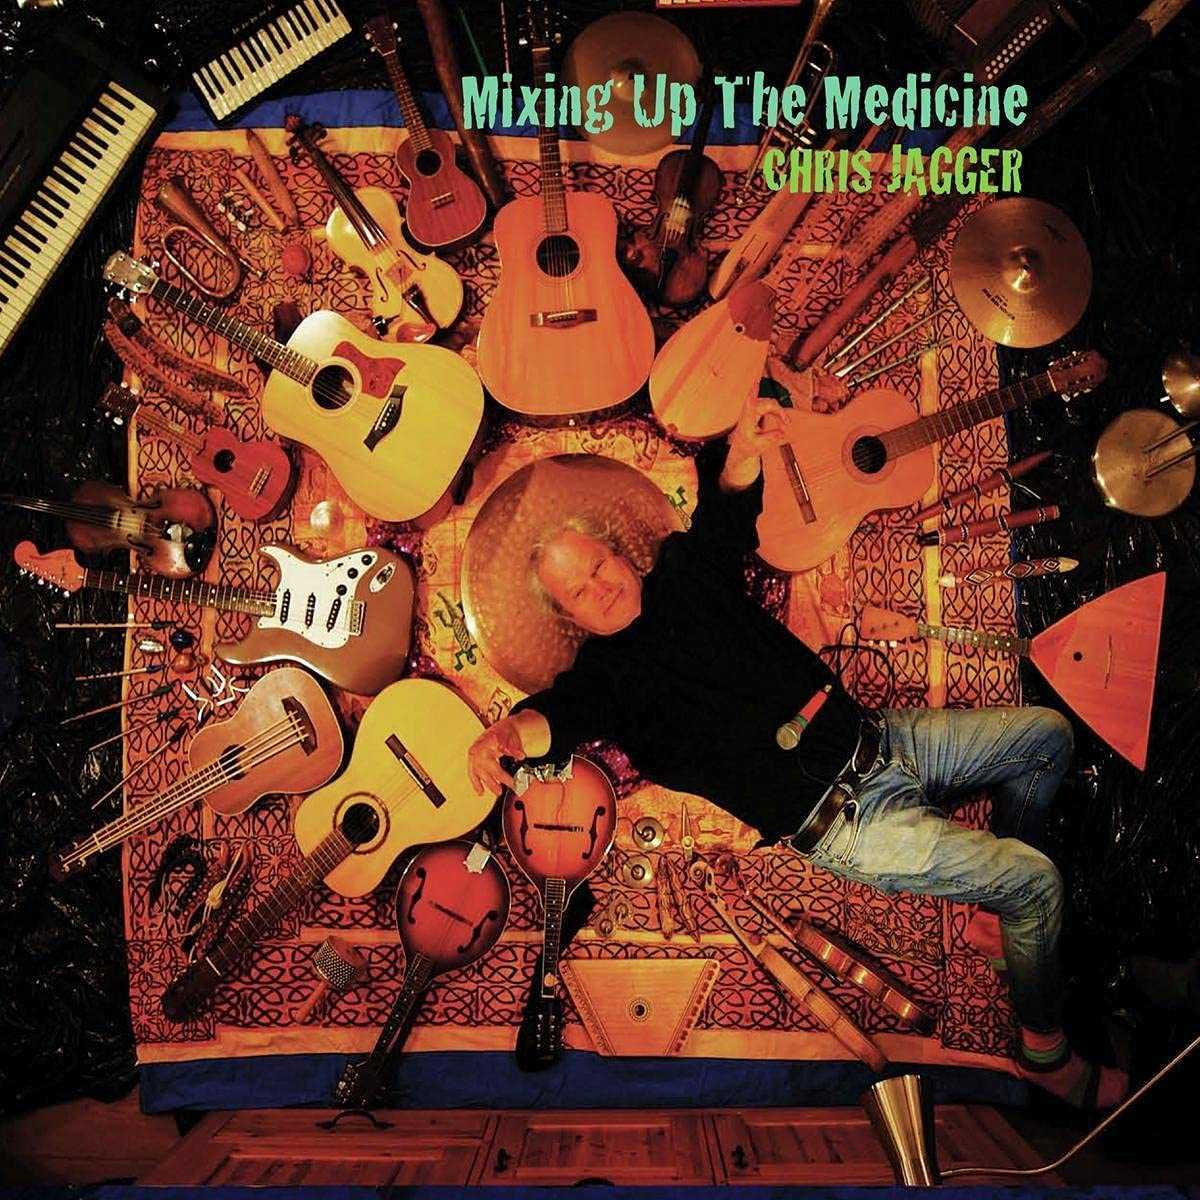 Chris Jagger - Mixing up the Medicine